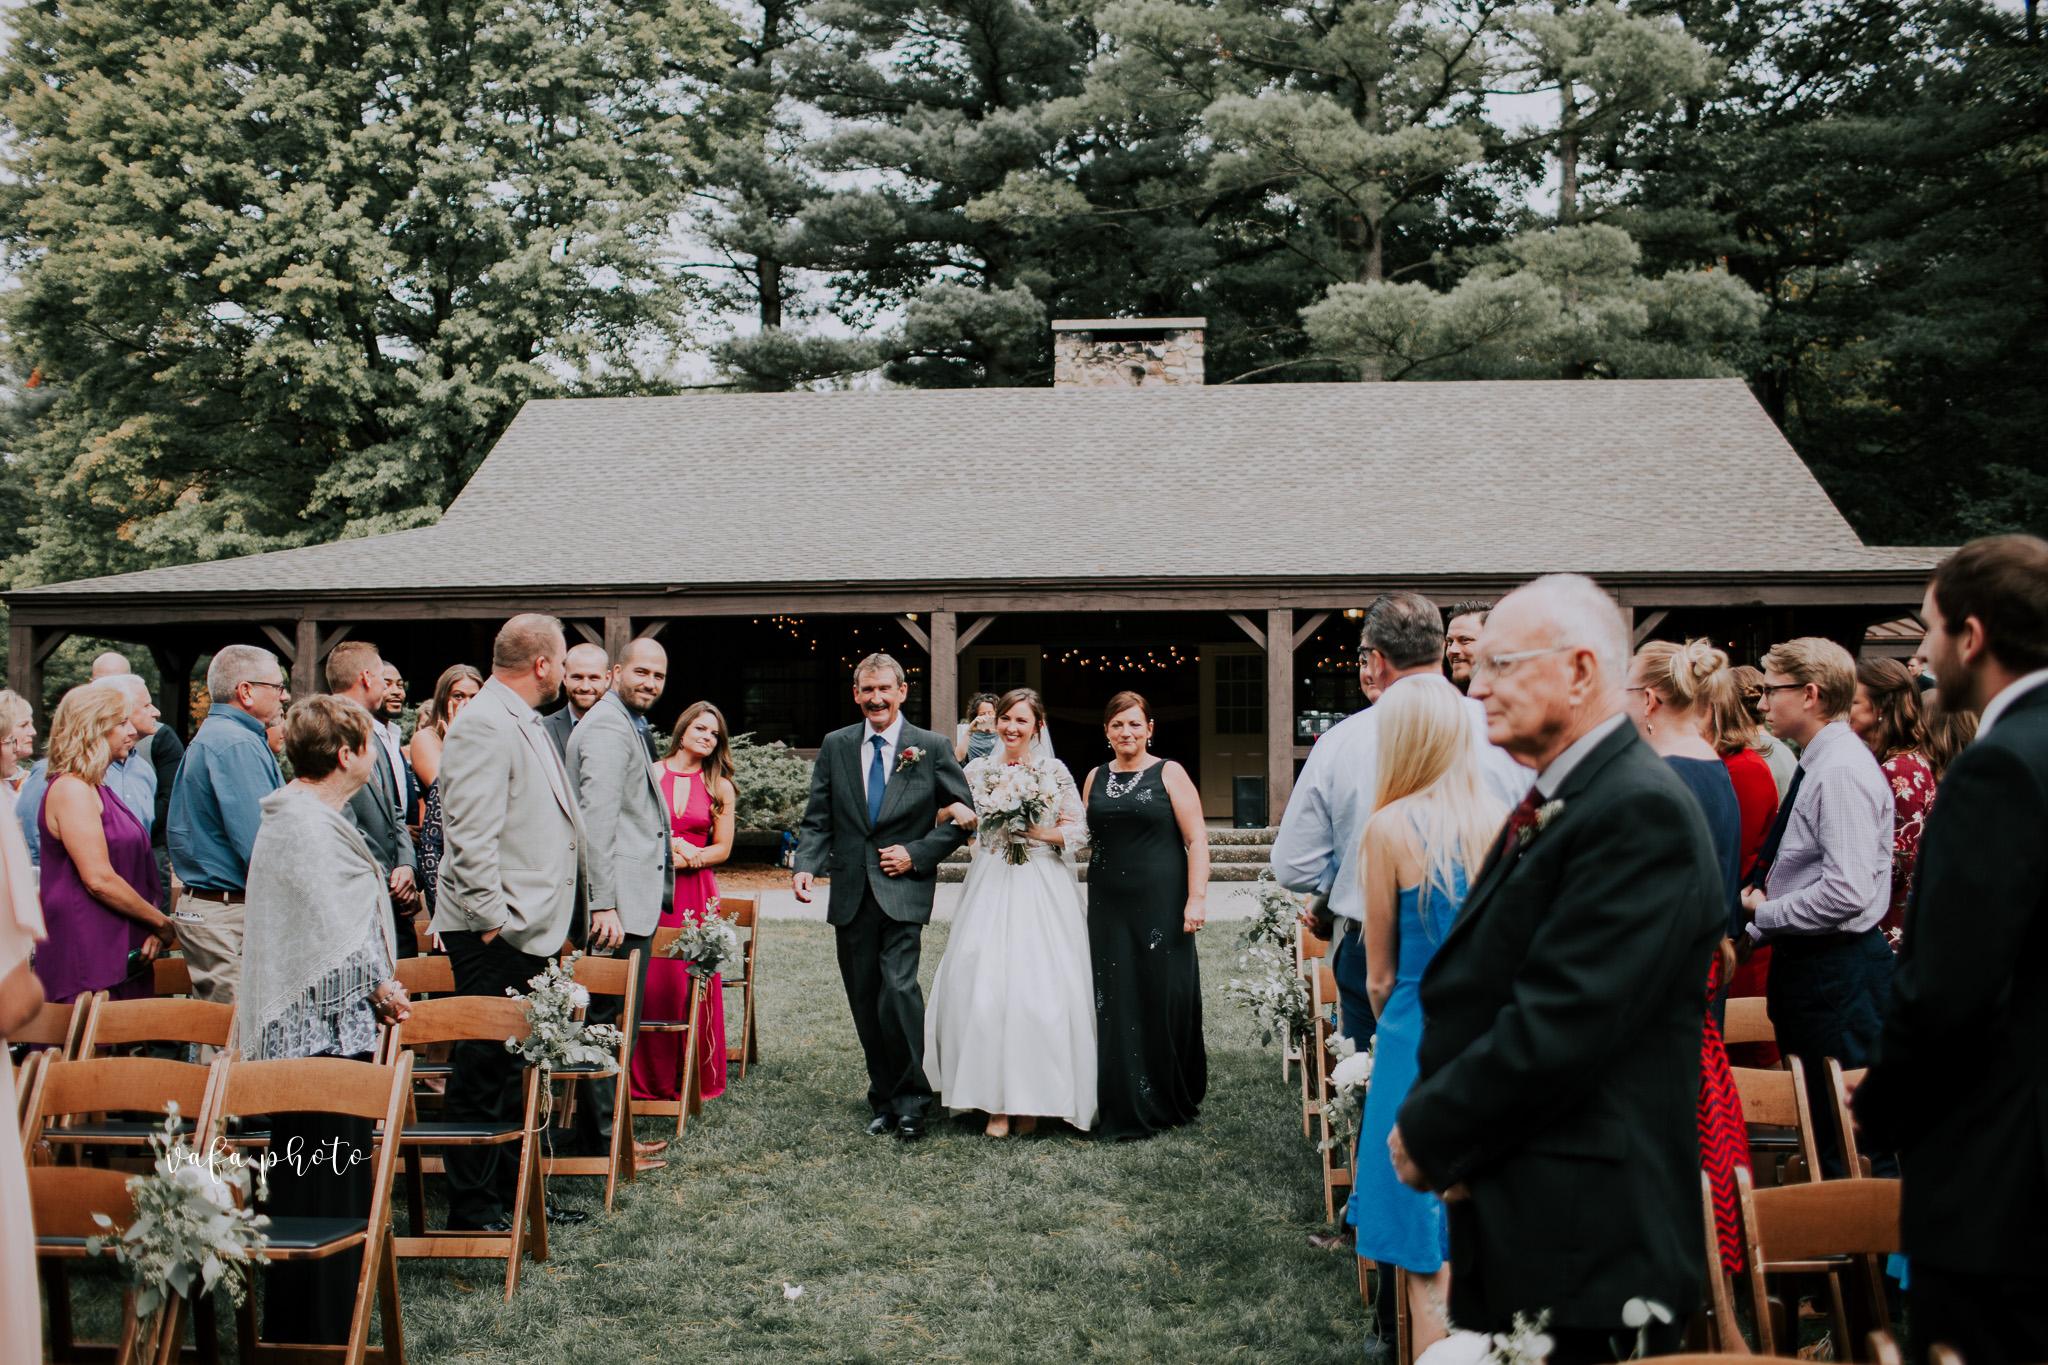 Grand-Rapids-Wedding-Danielle-Brian-Vafa-Photo-666.jpg